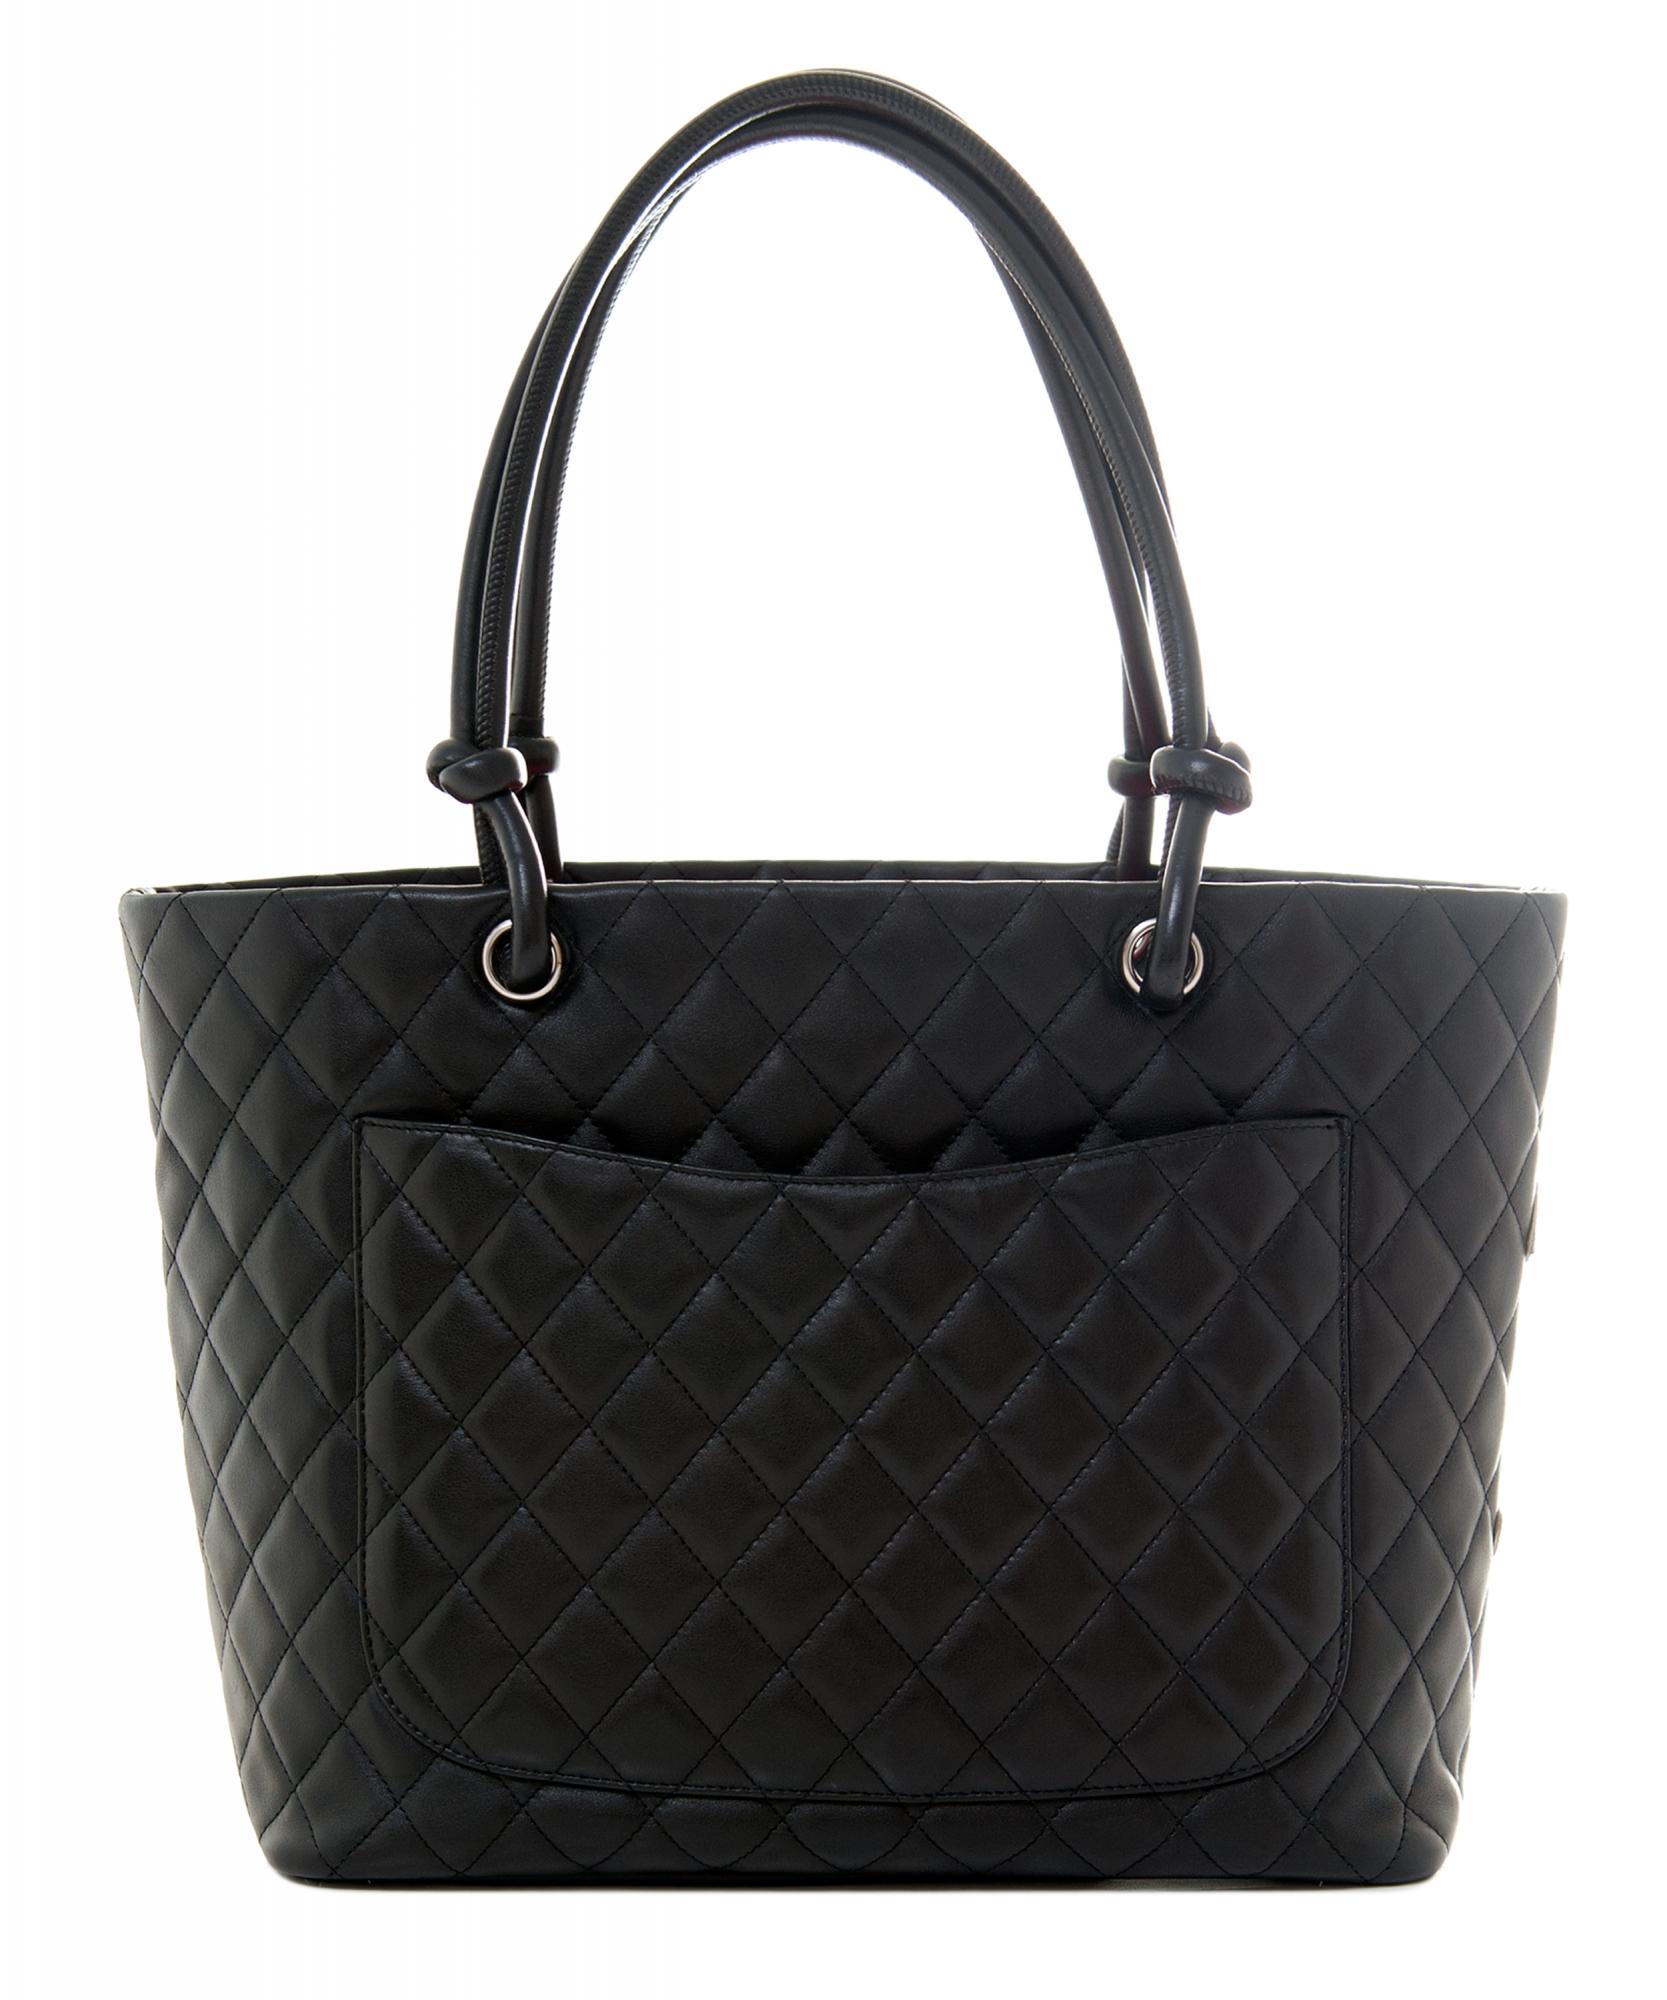 Chanel Black Calfskin Backpack with Gold HW | Chanel black